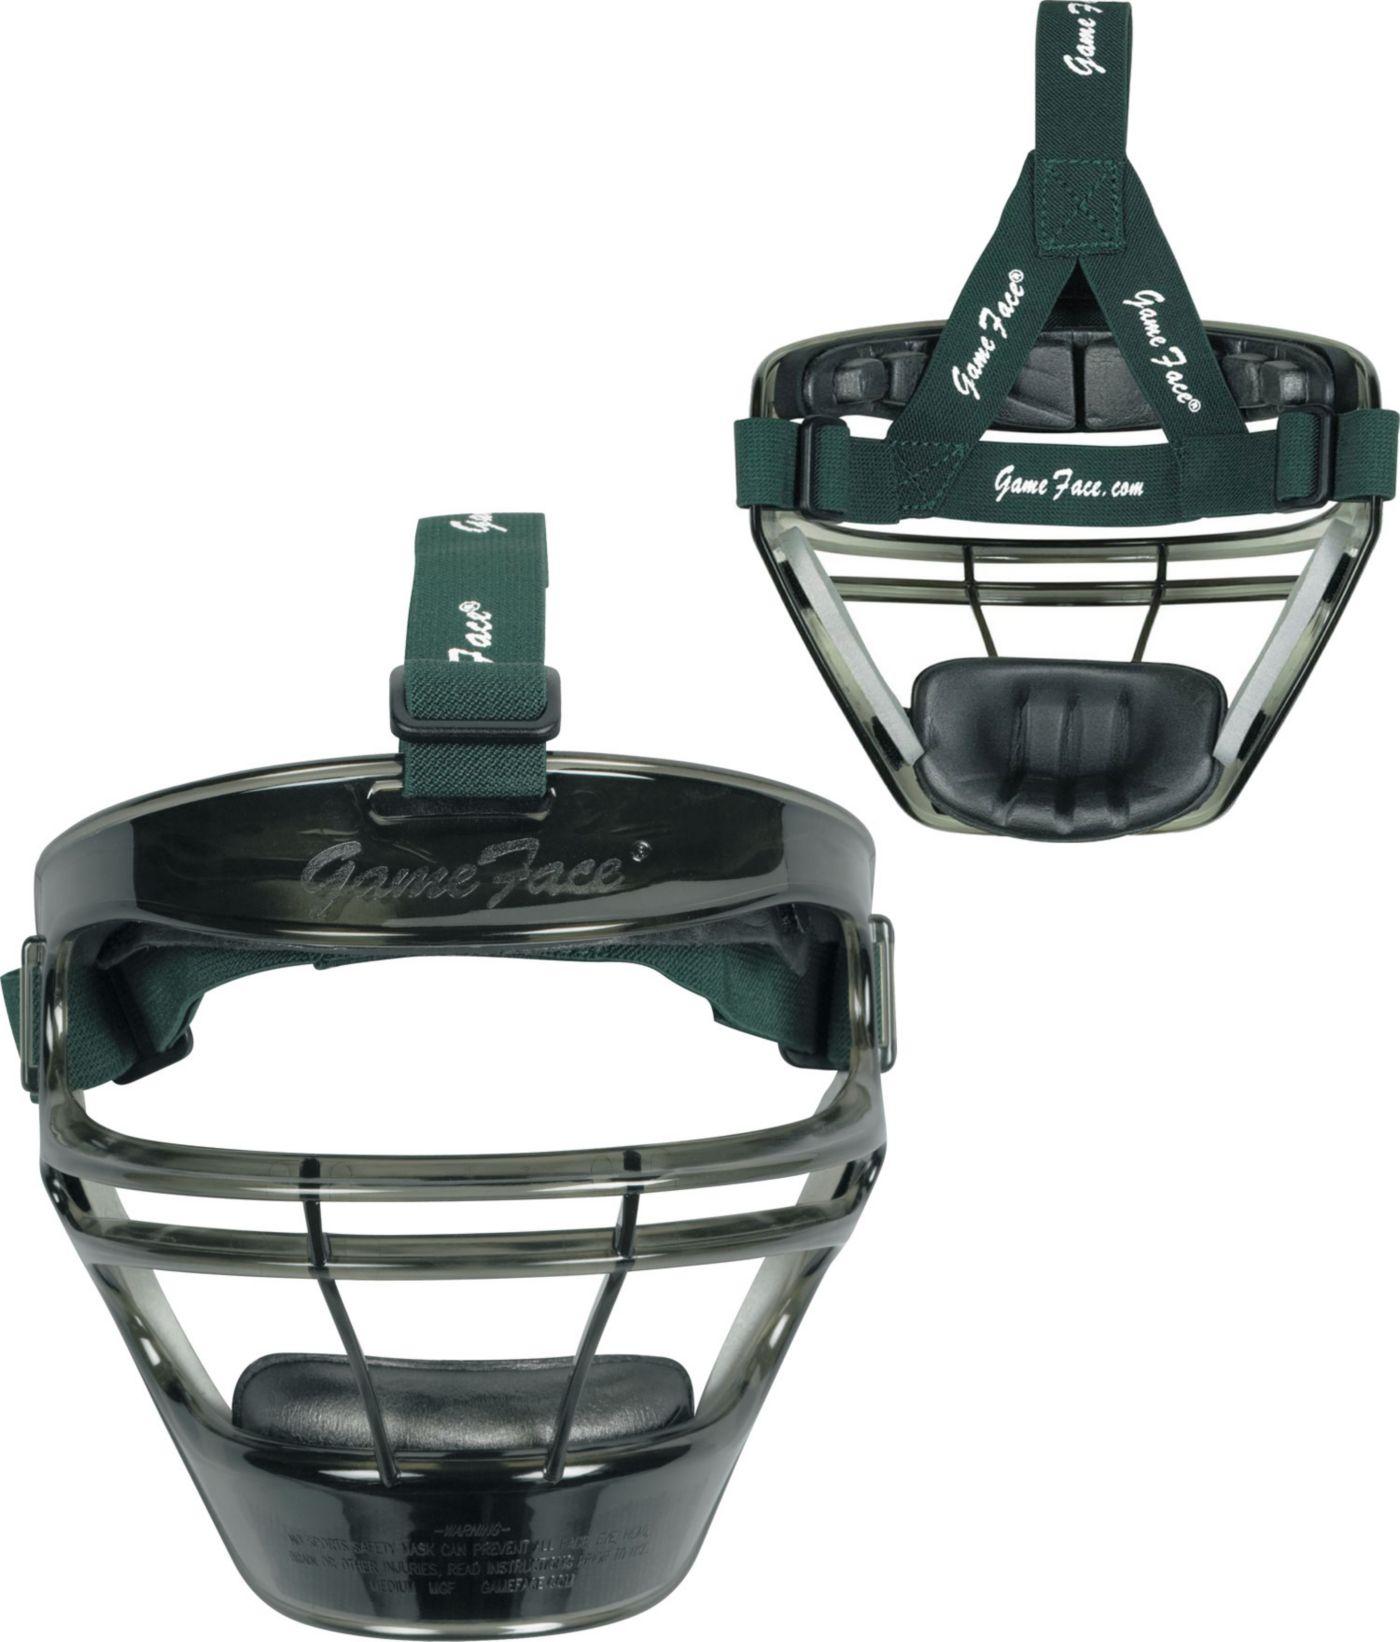 Markwort Game Face Smoke Softball Safety Face Guard - Medium